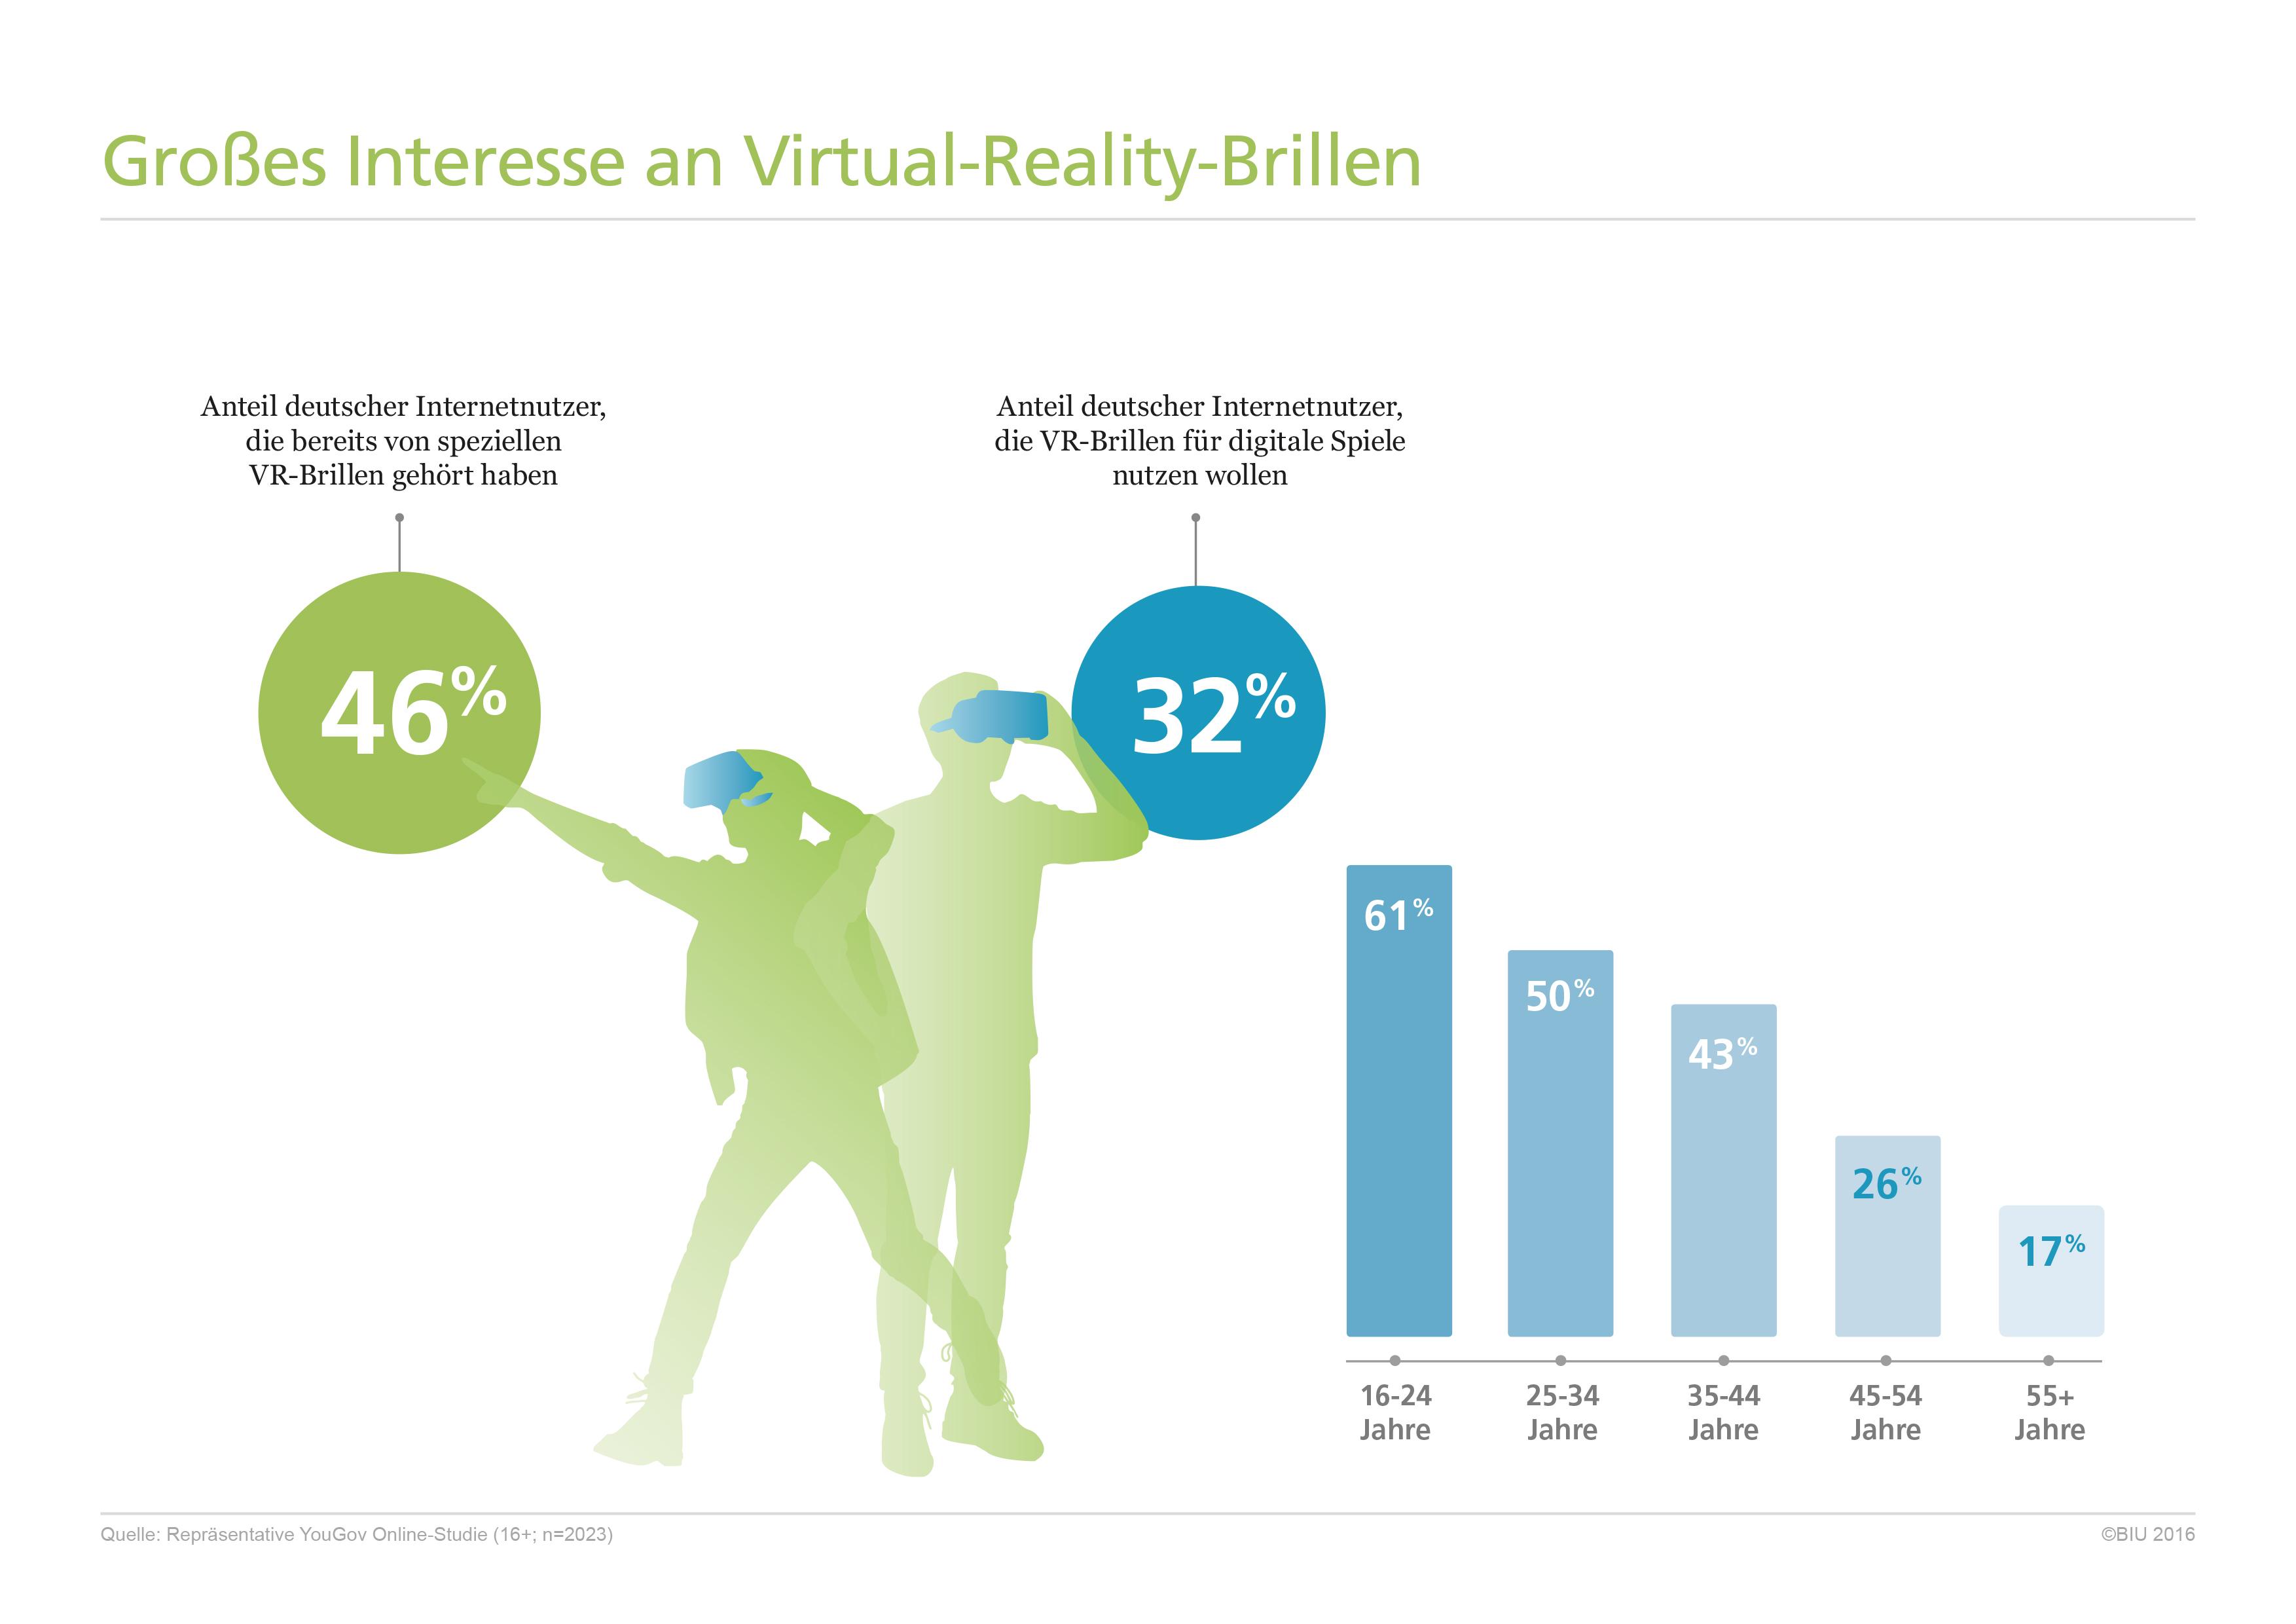 Interesse an Virtual-Reality-Brillen